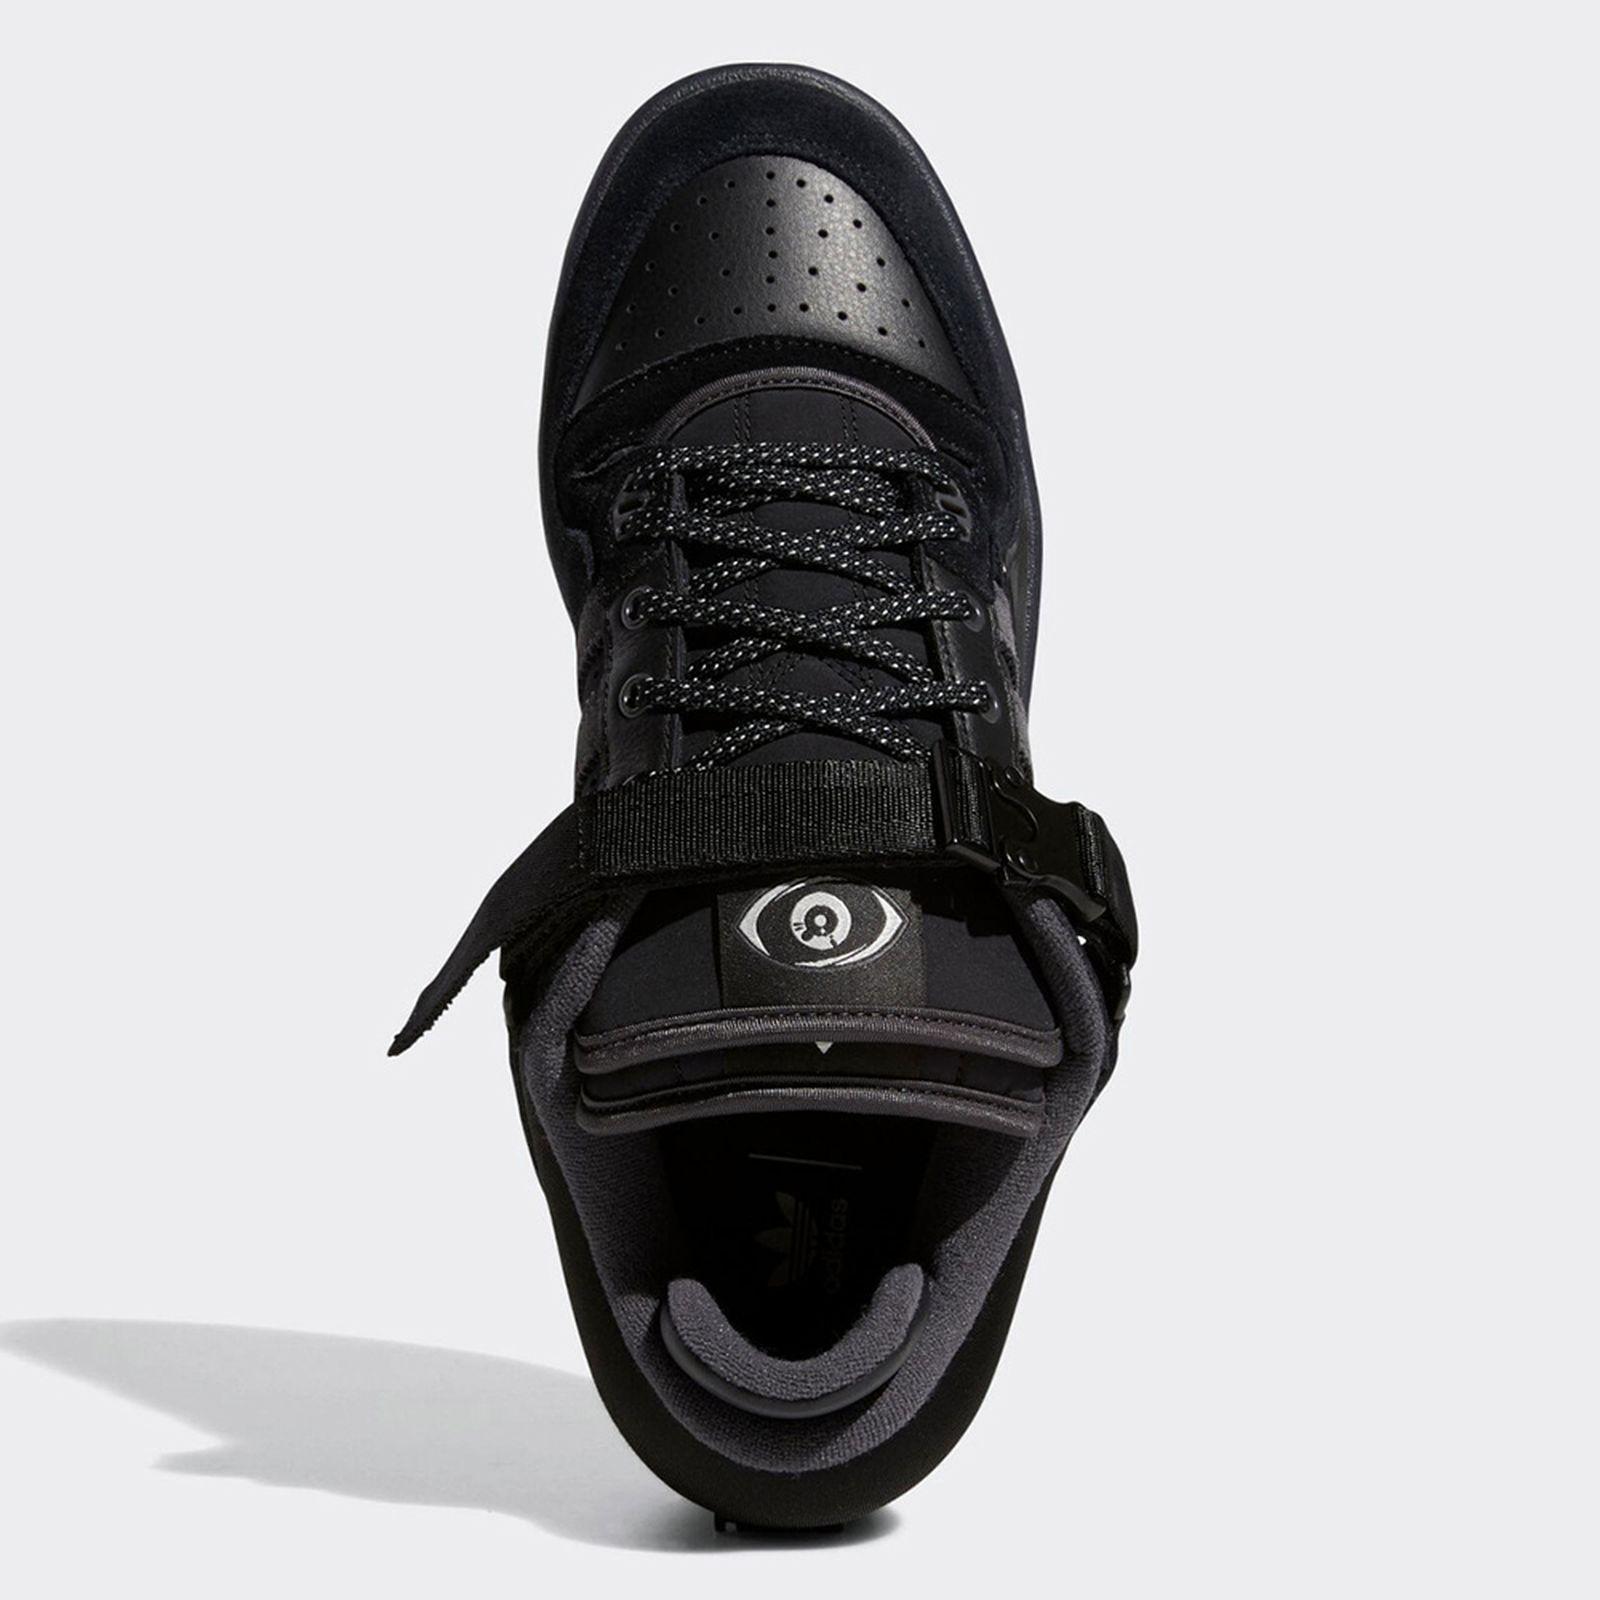 bad-bunny-adidas-originals-forum-low-triple-black-release-date-price-07